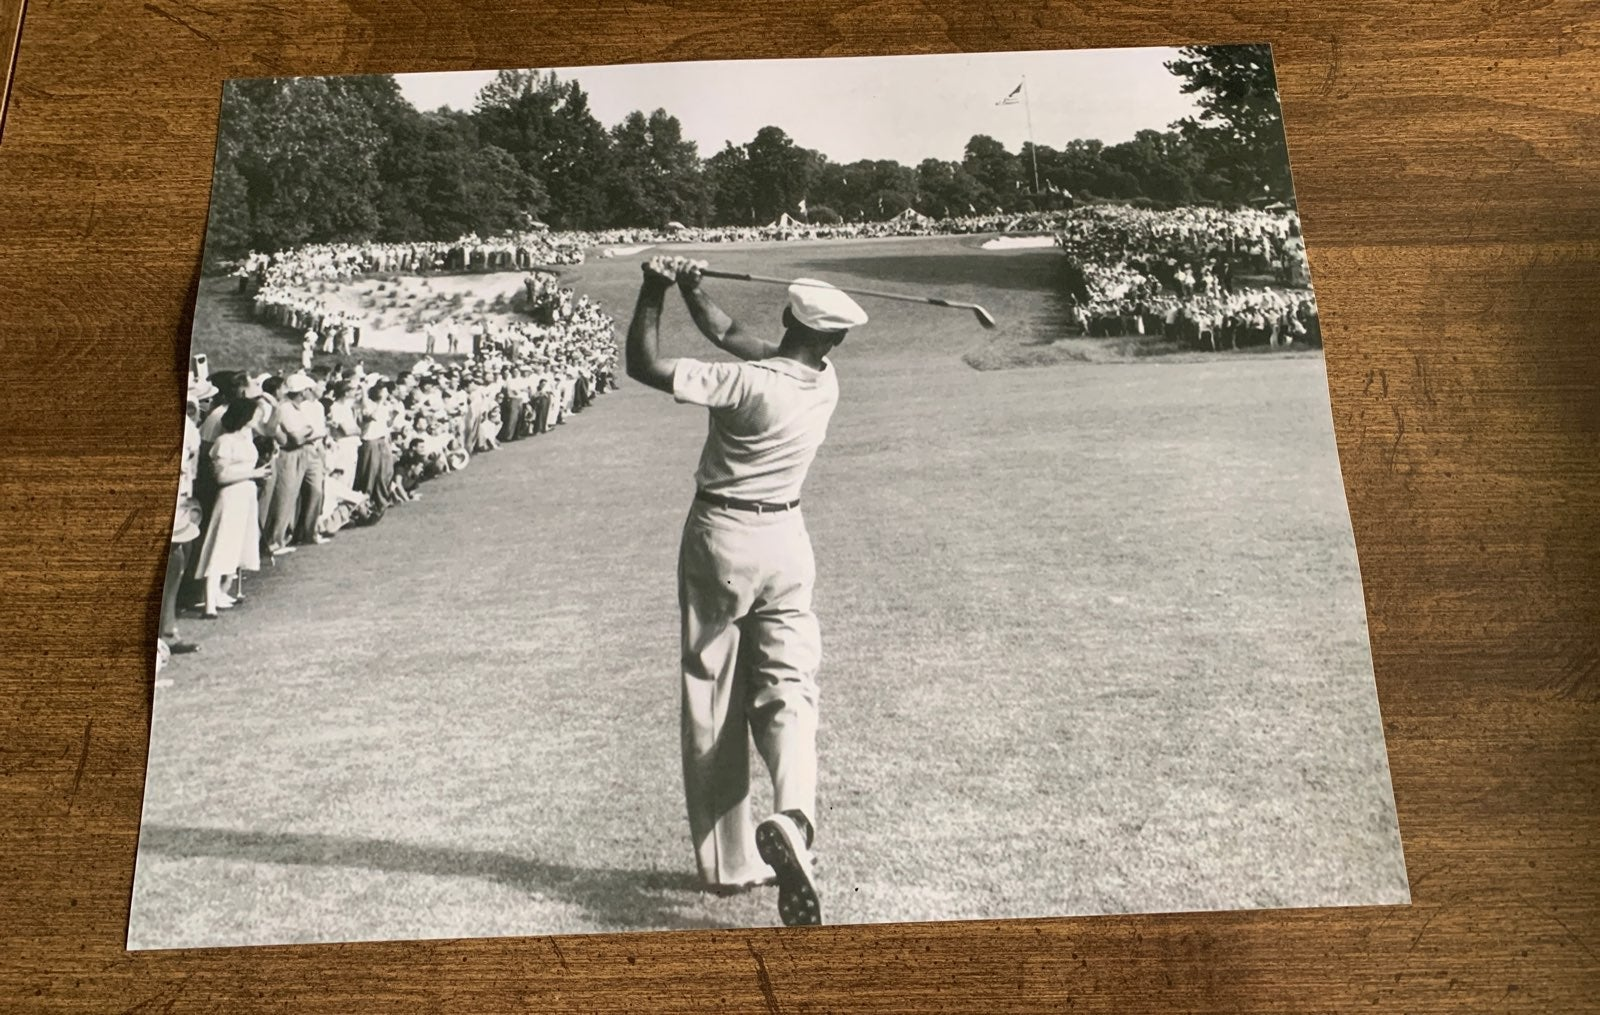 Ben Hogan 1 iron Merion golf 11x14 photo